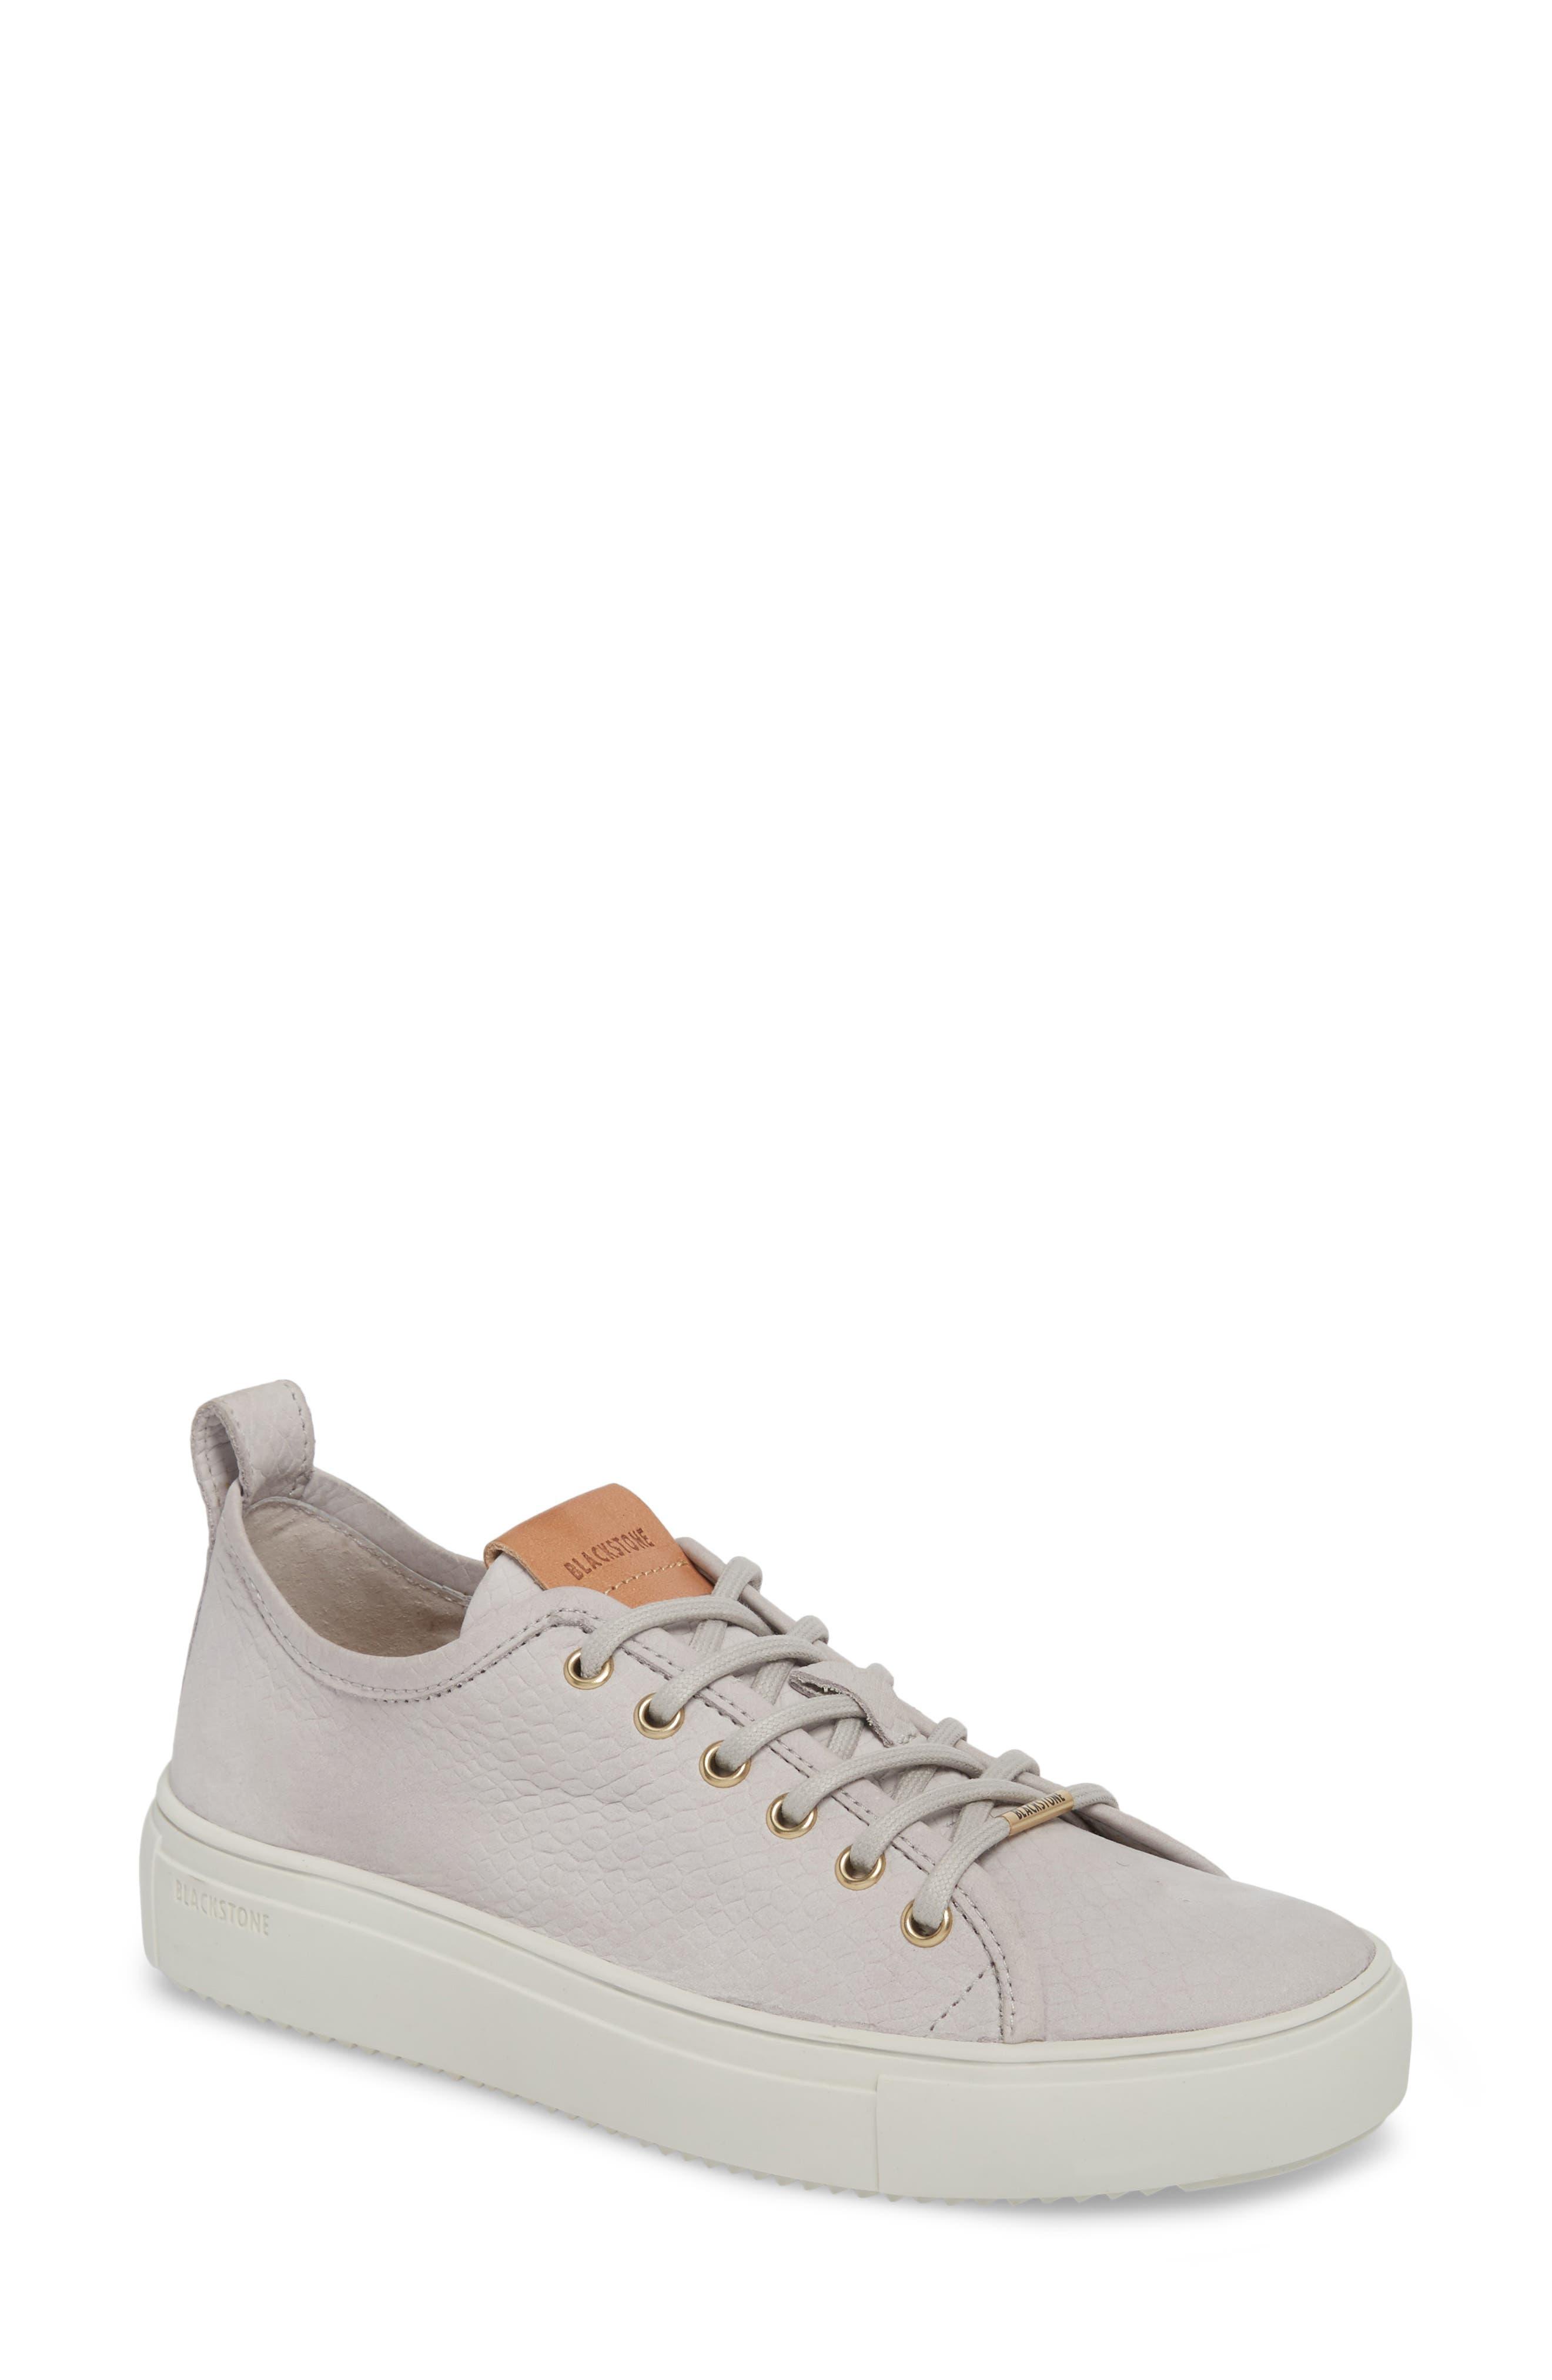 PL90 Sneaker,                         Main,                         color, MYCRO CHIP LEATHER